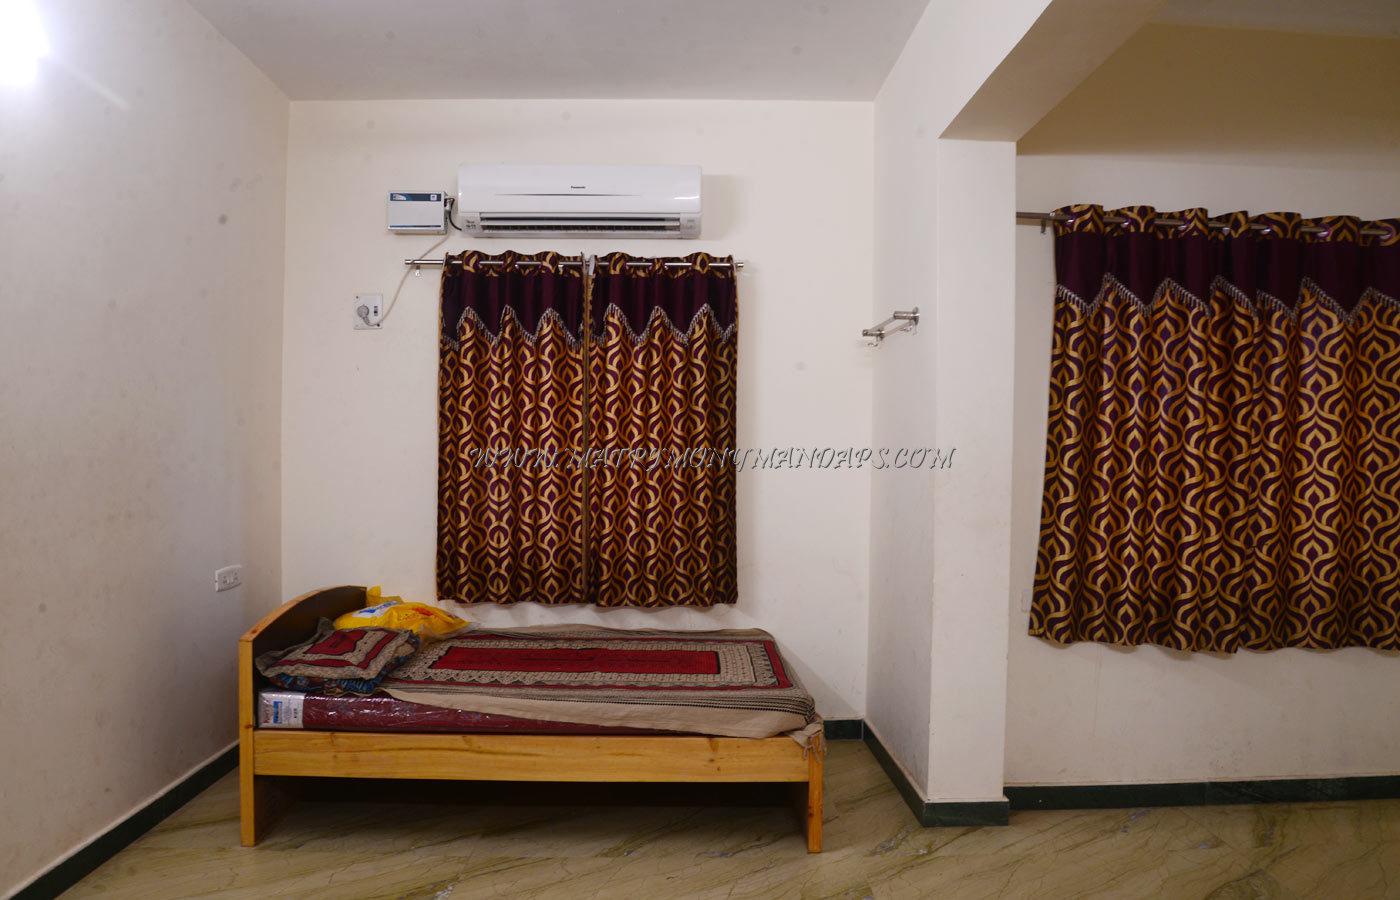 Rajeshwari Navaraj Mahal - Rooms